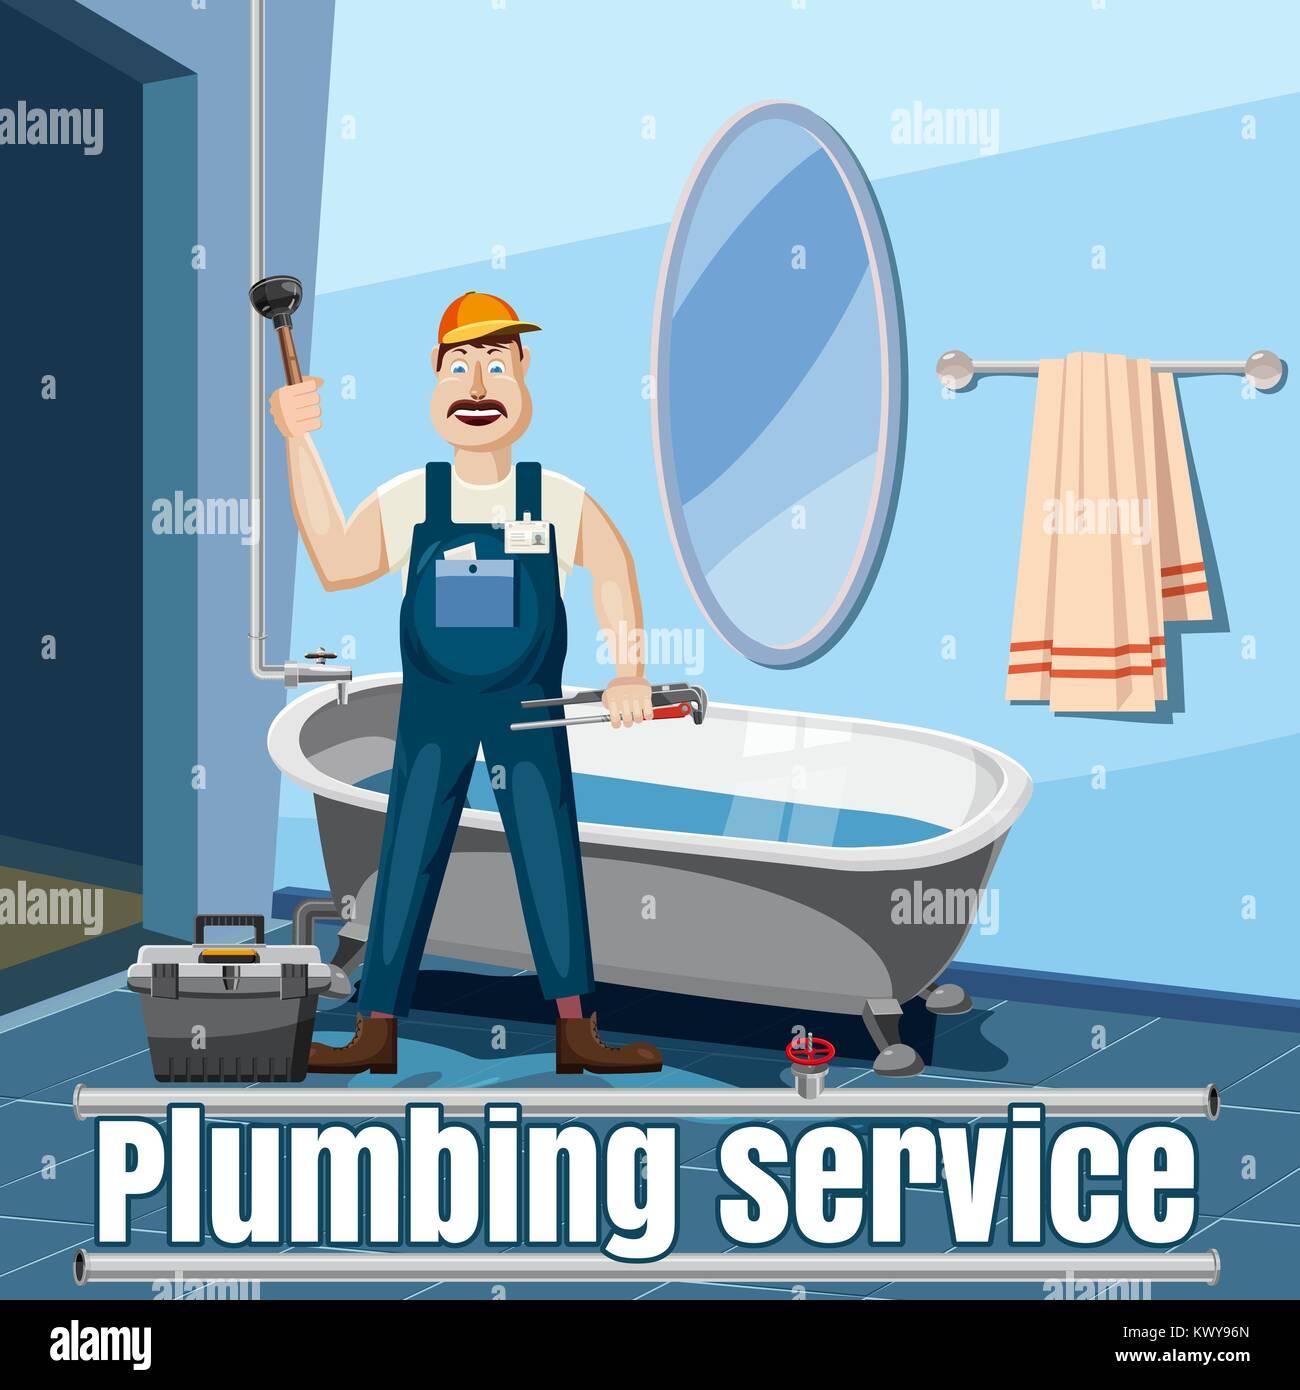 Plumber repair service concept, cartoon style - Stock Image